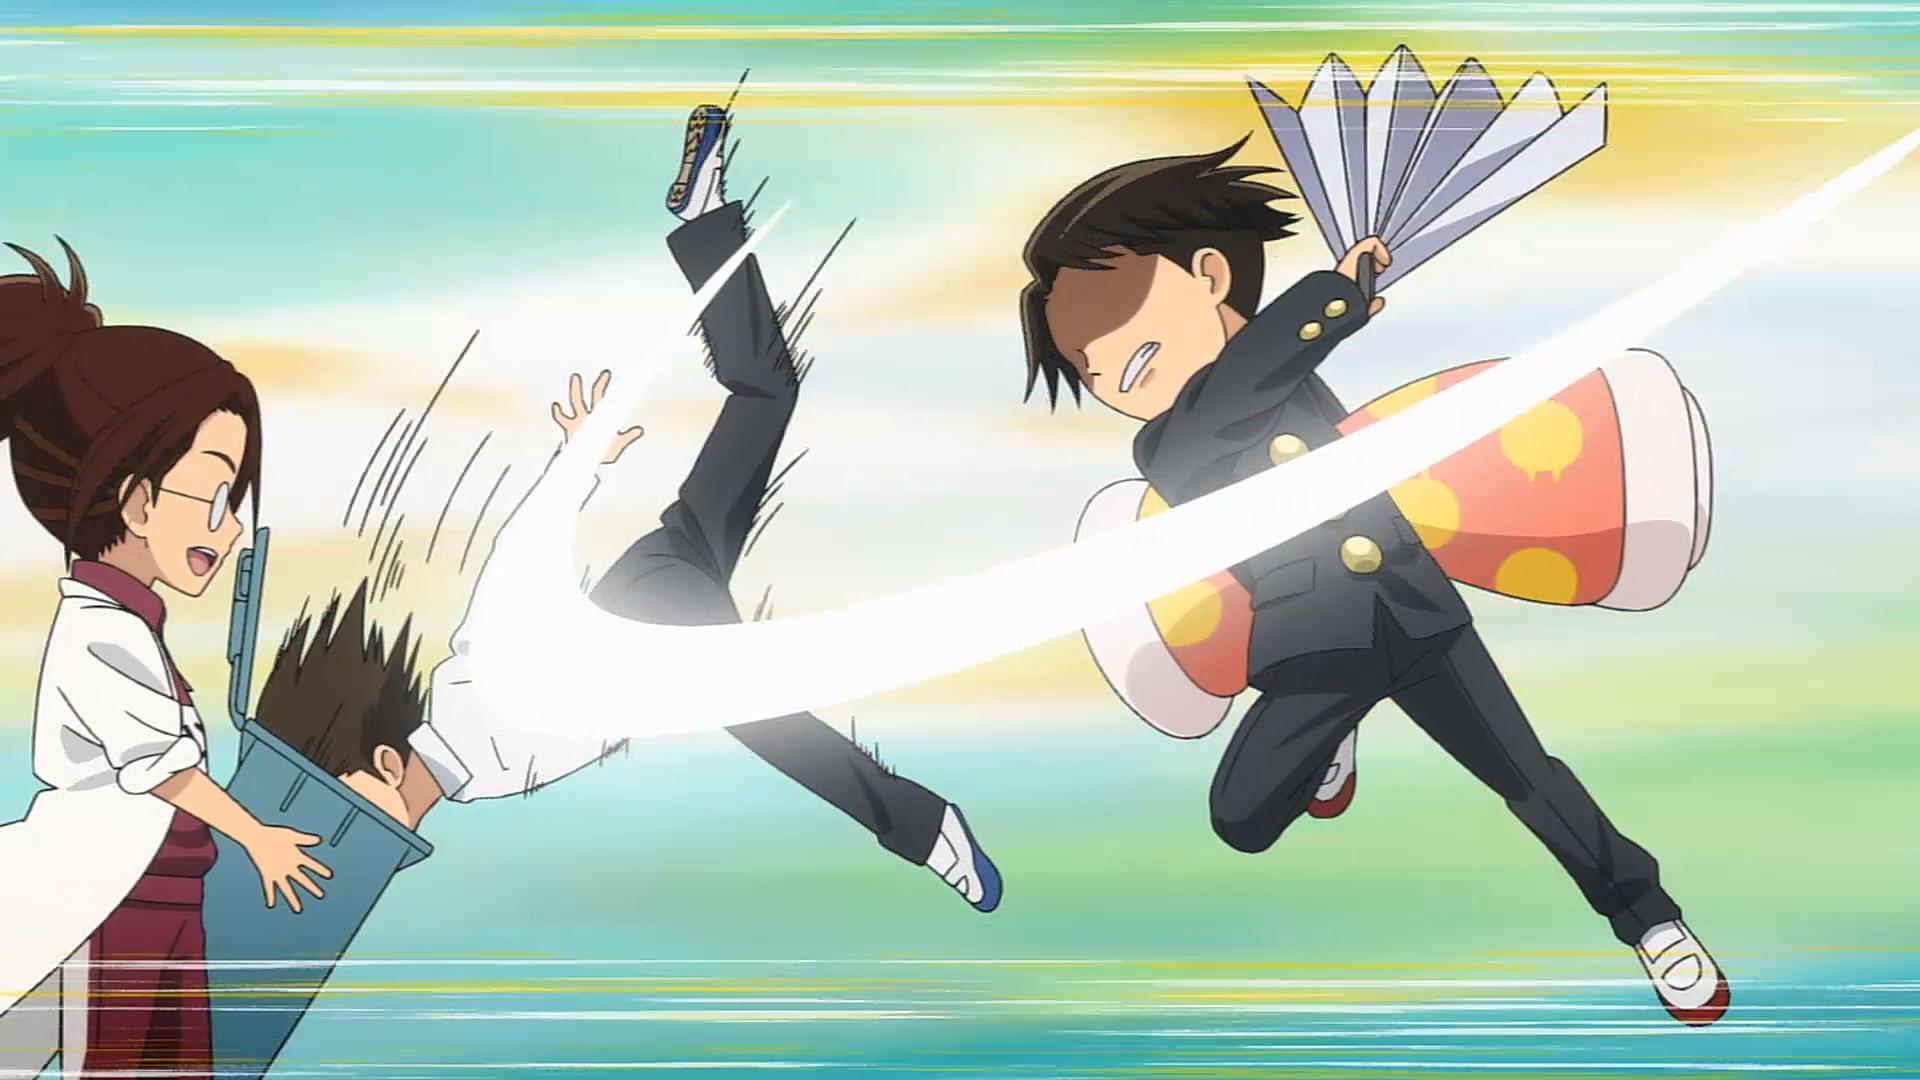 Levi (Junior High Anime)   Attack on Titan Wiki   FANDOM powered by